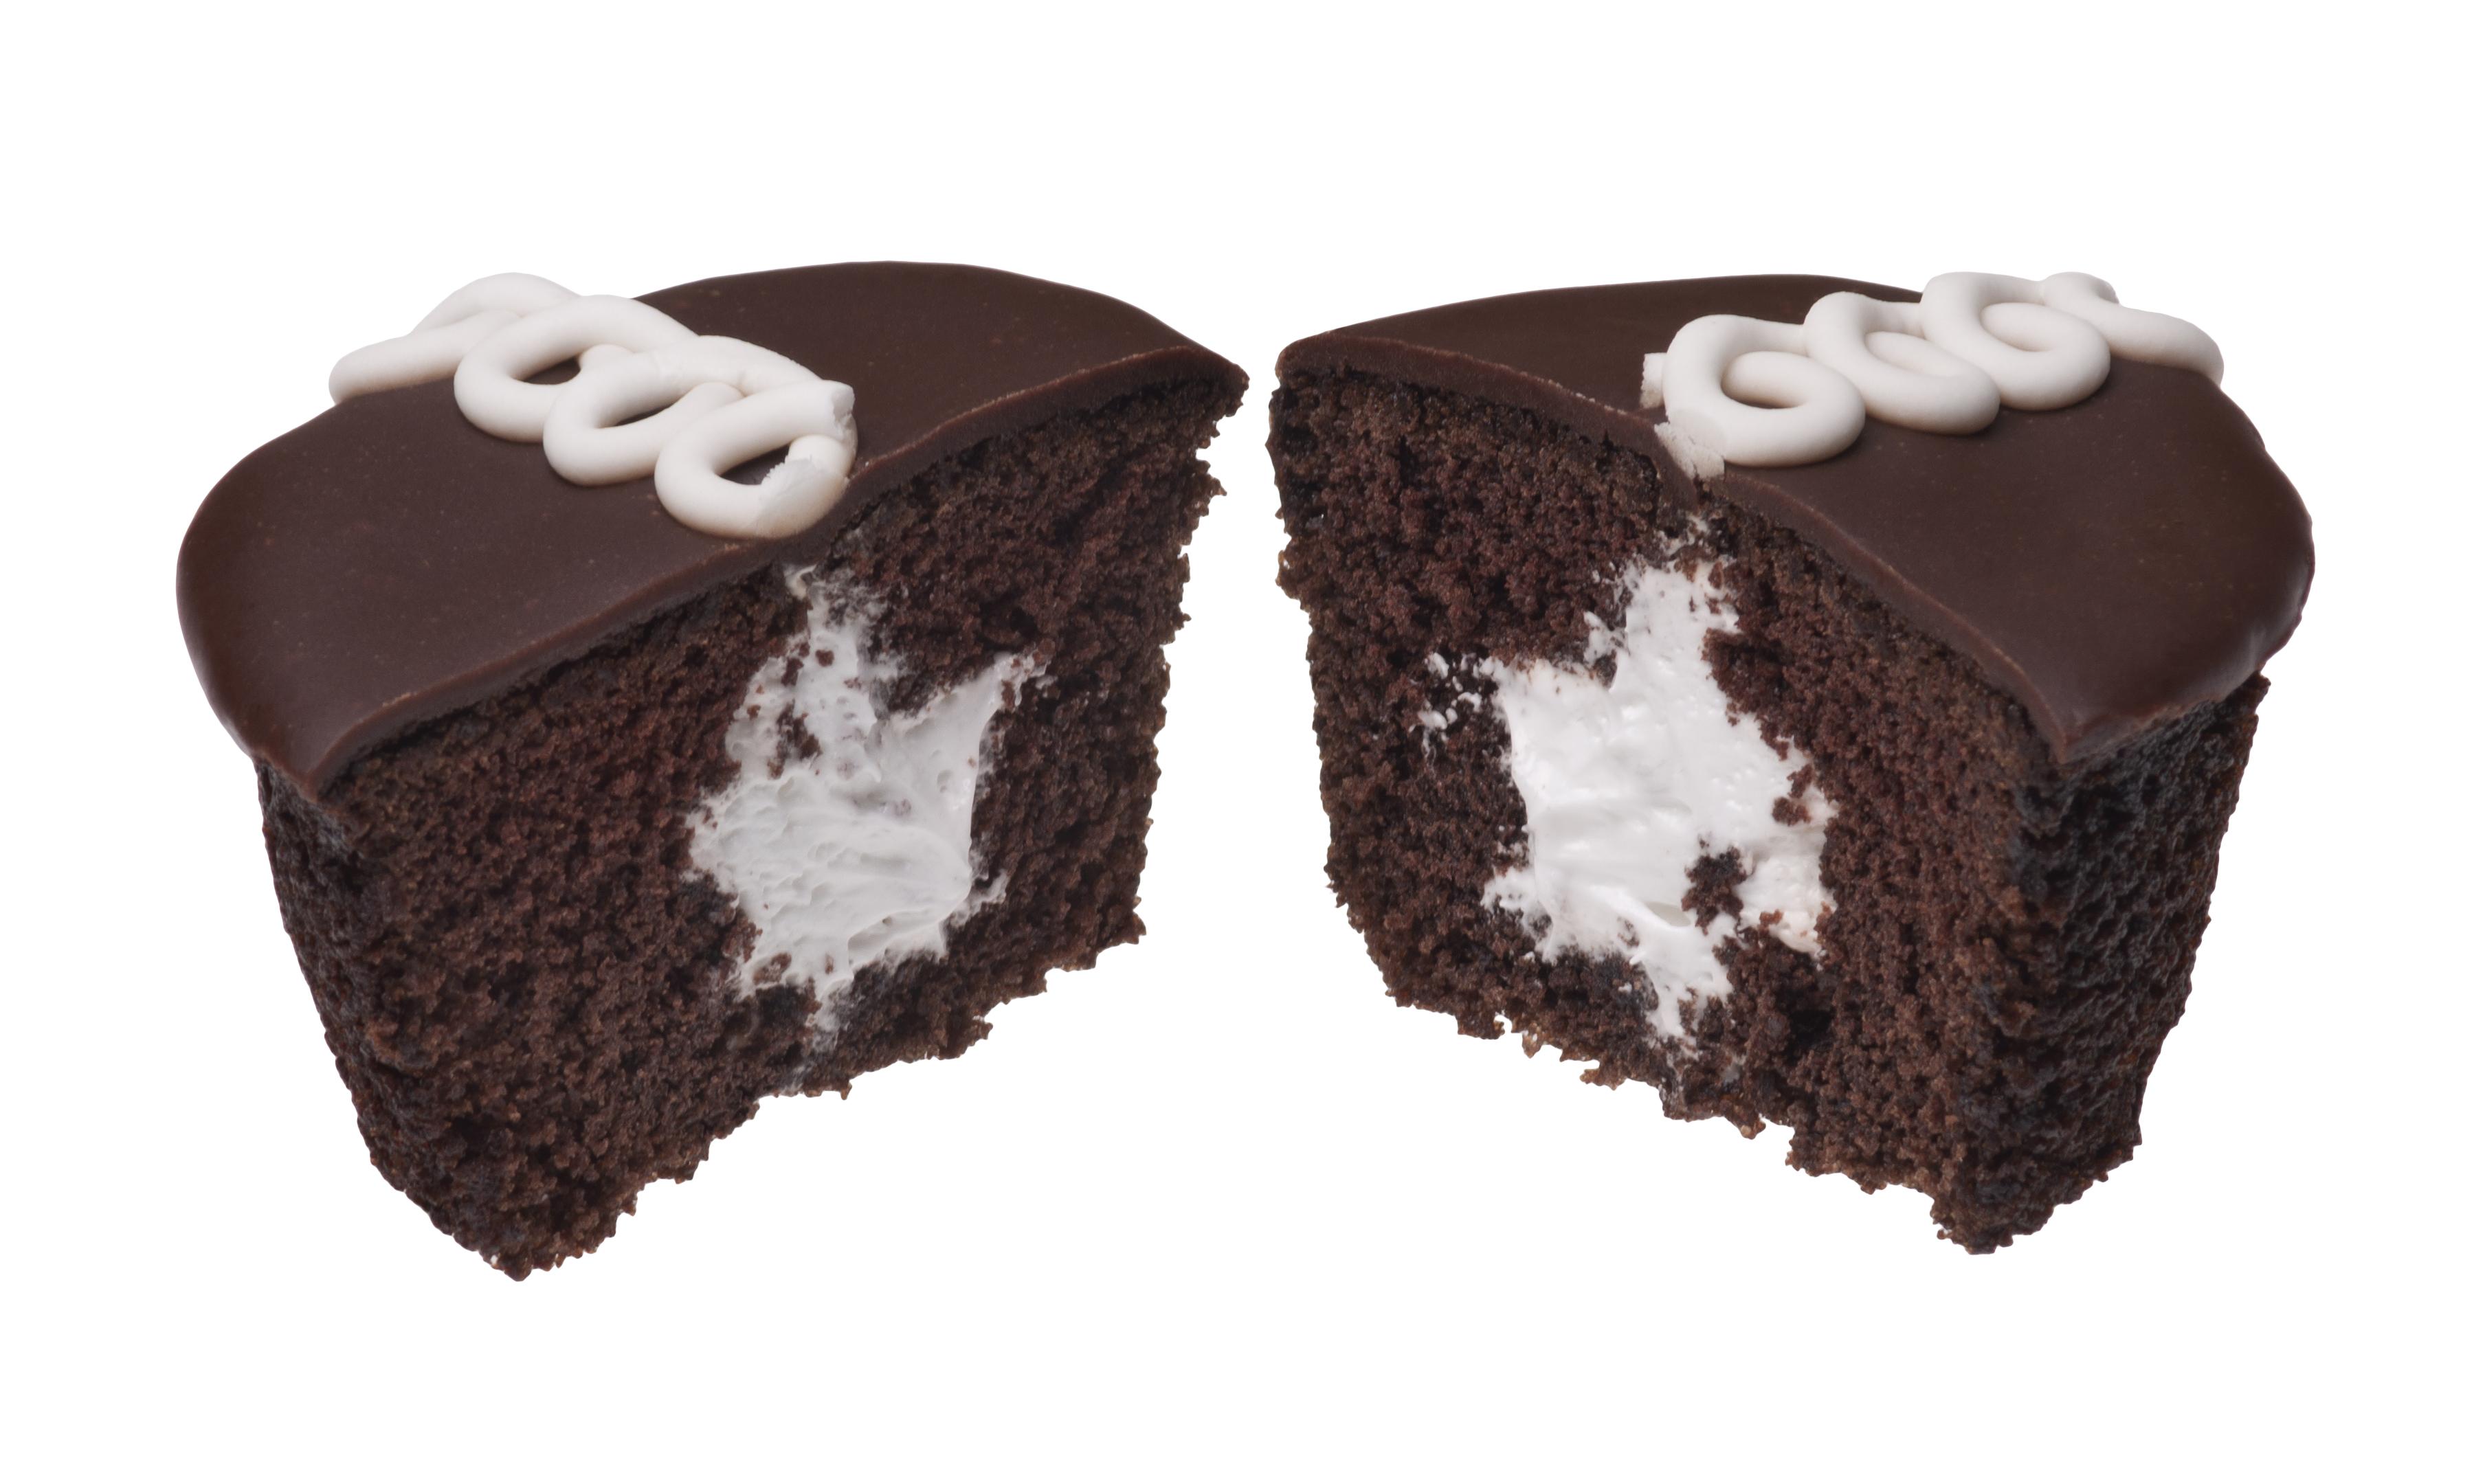 Chocolate Cream Filled Snack Cakes